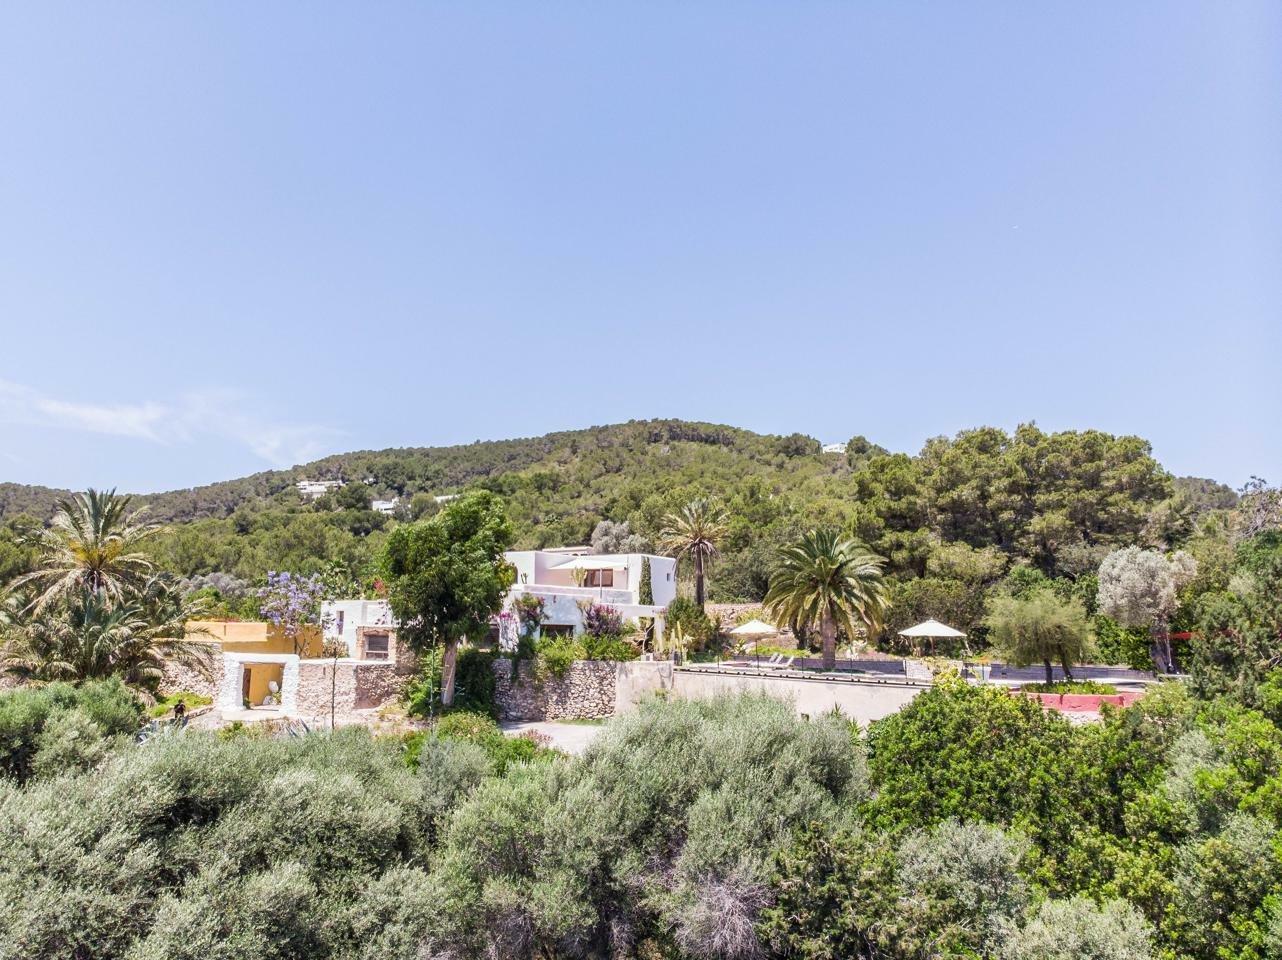 Villa in Sant Josep de sa Talaia, Balearic Islands, Spain 1 - 11404570